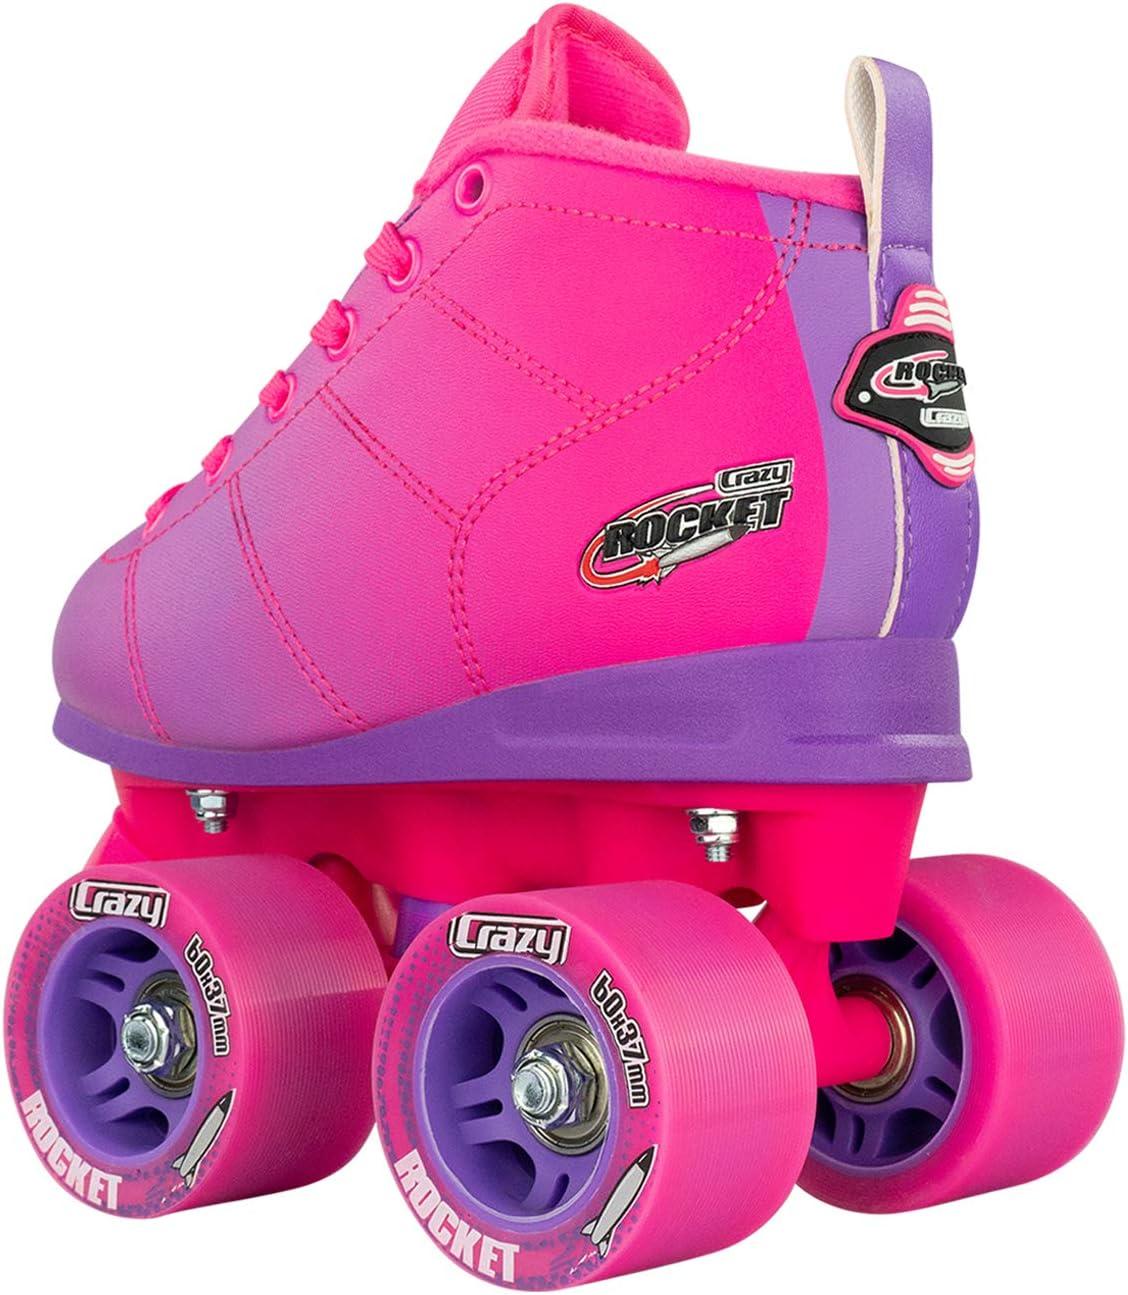 Available in Two Crazy Skates Rocket Roller Skates for Girls and Boys Great Beginner Kids Quad Skate